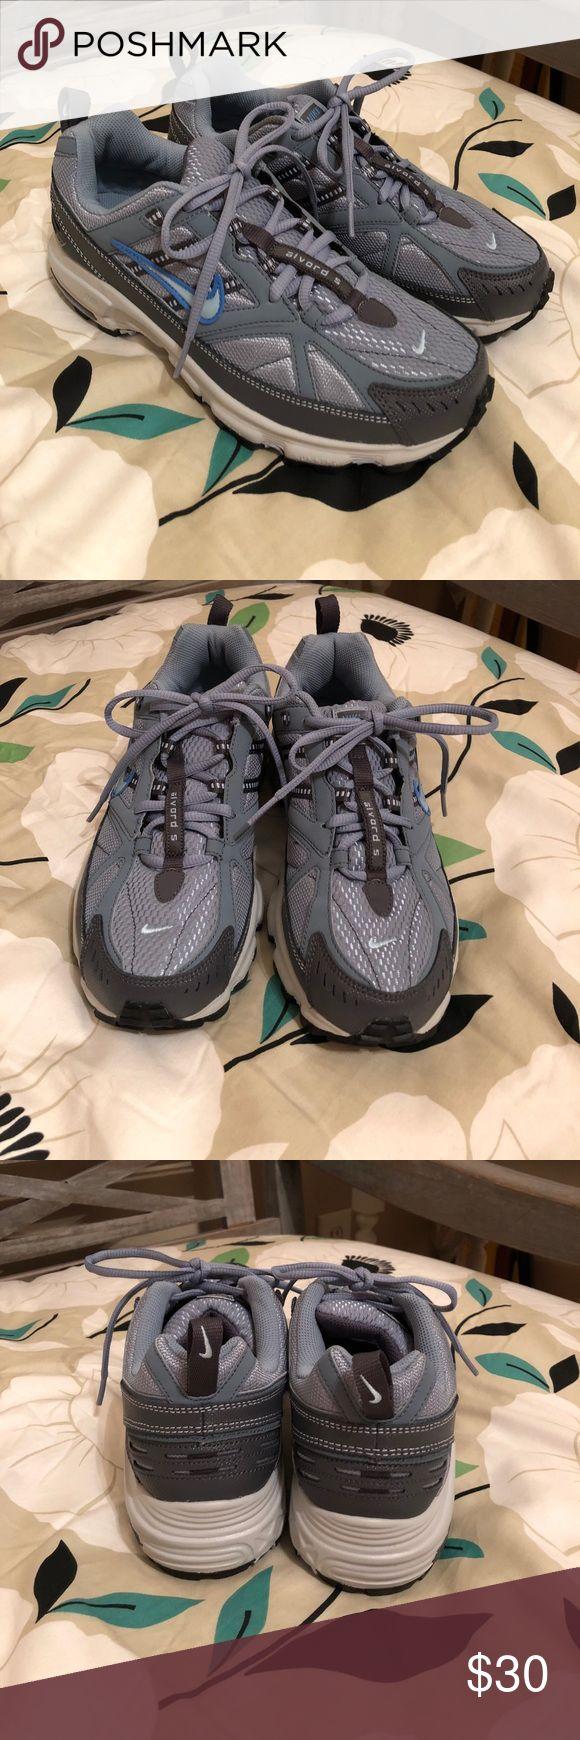 Nike Dart IV Plus trail running shoe Brand new in box. Never worn! Nike Shoes Sneakers